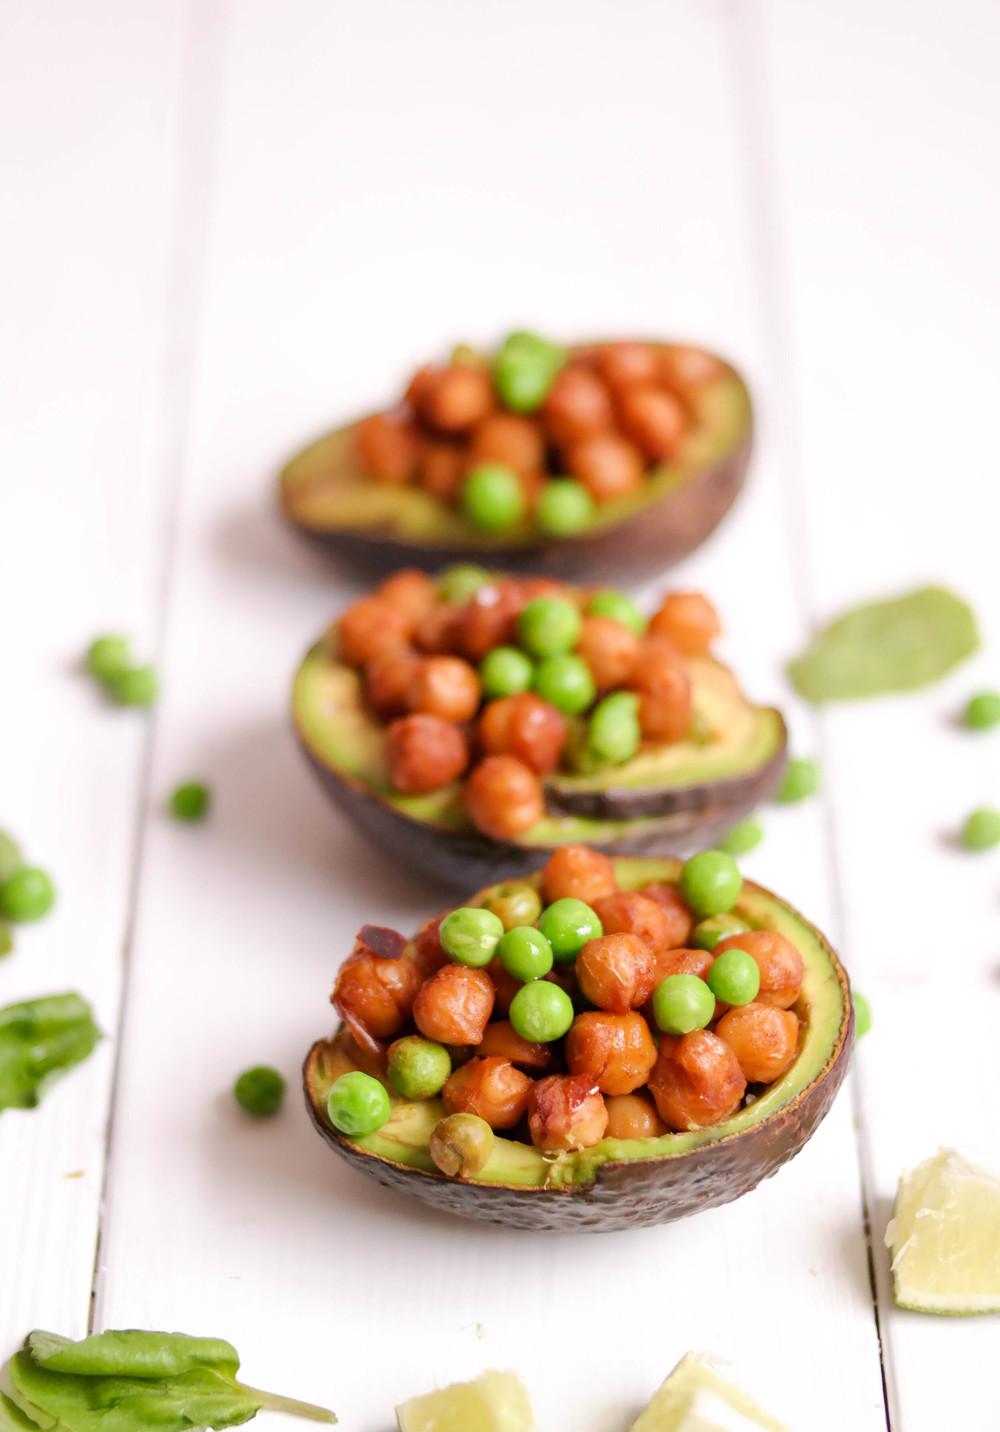 4-Stuffed-Avocado-with-Chili-Chickpeas | www.8thandlake.com